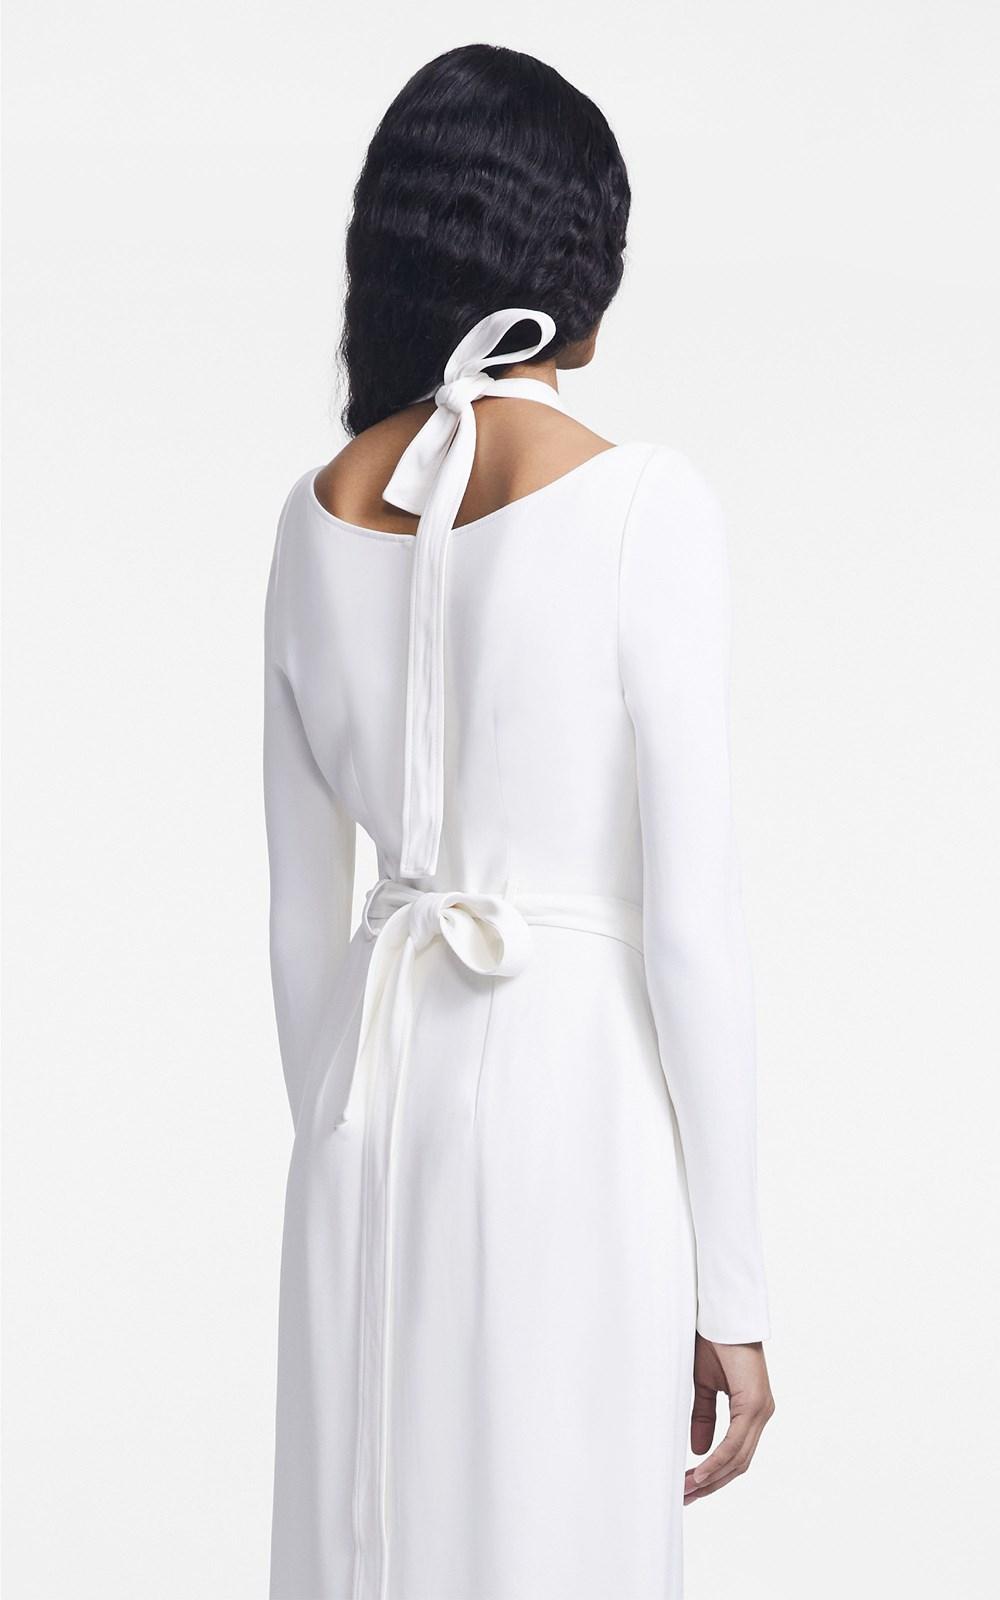 Dresses | DOUBLE LOOP LS DRESS